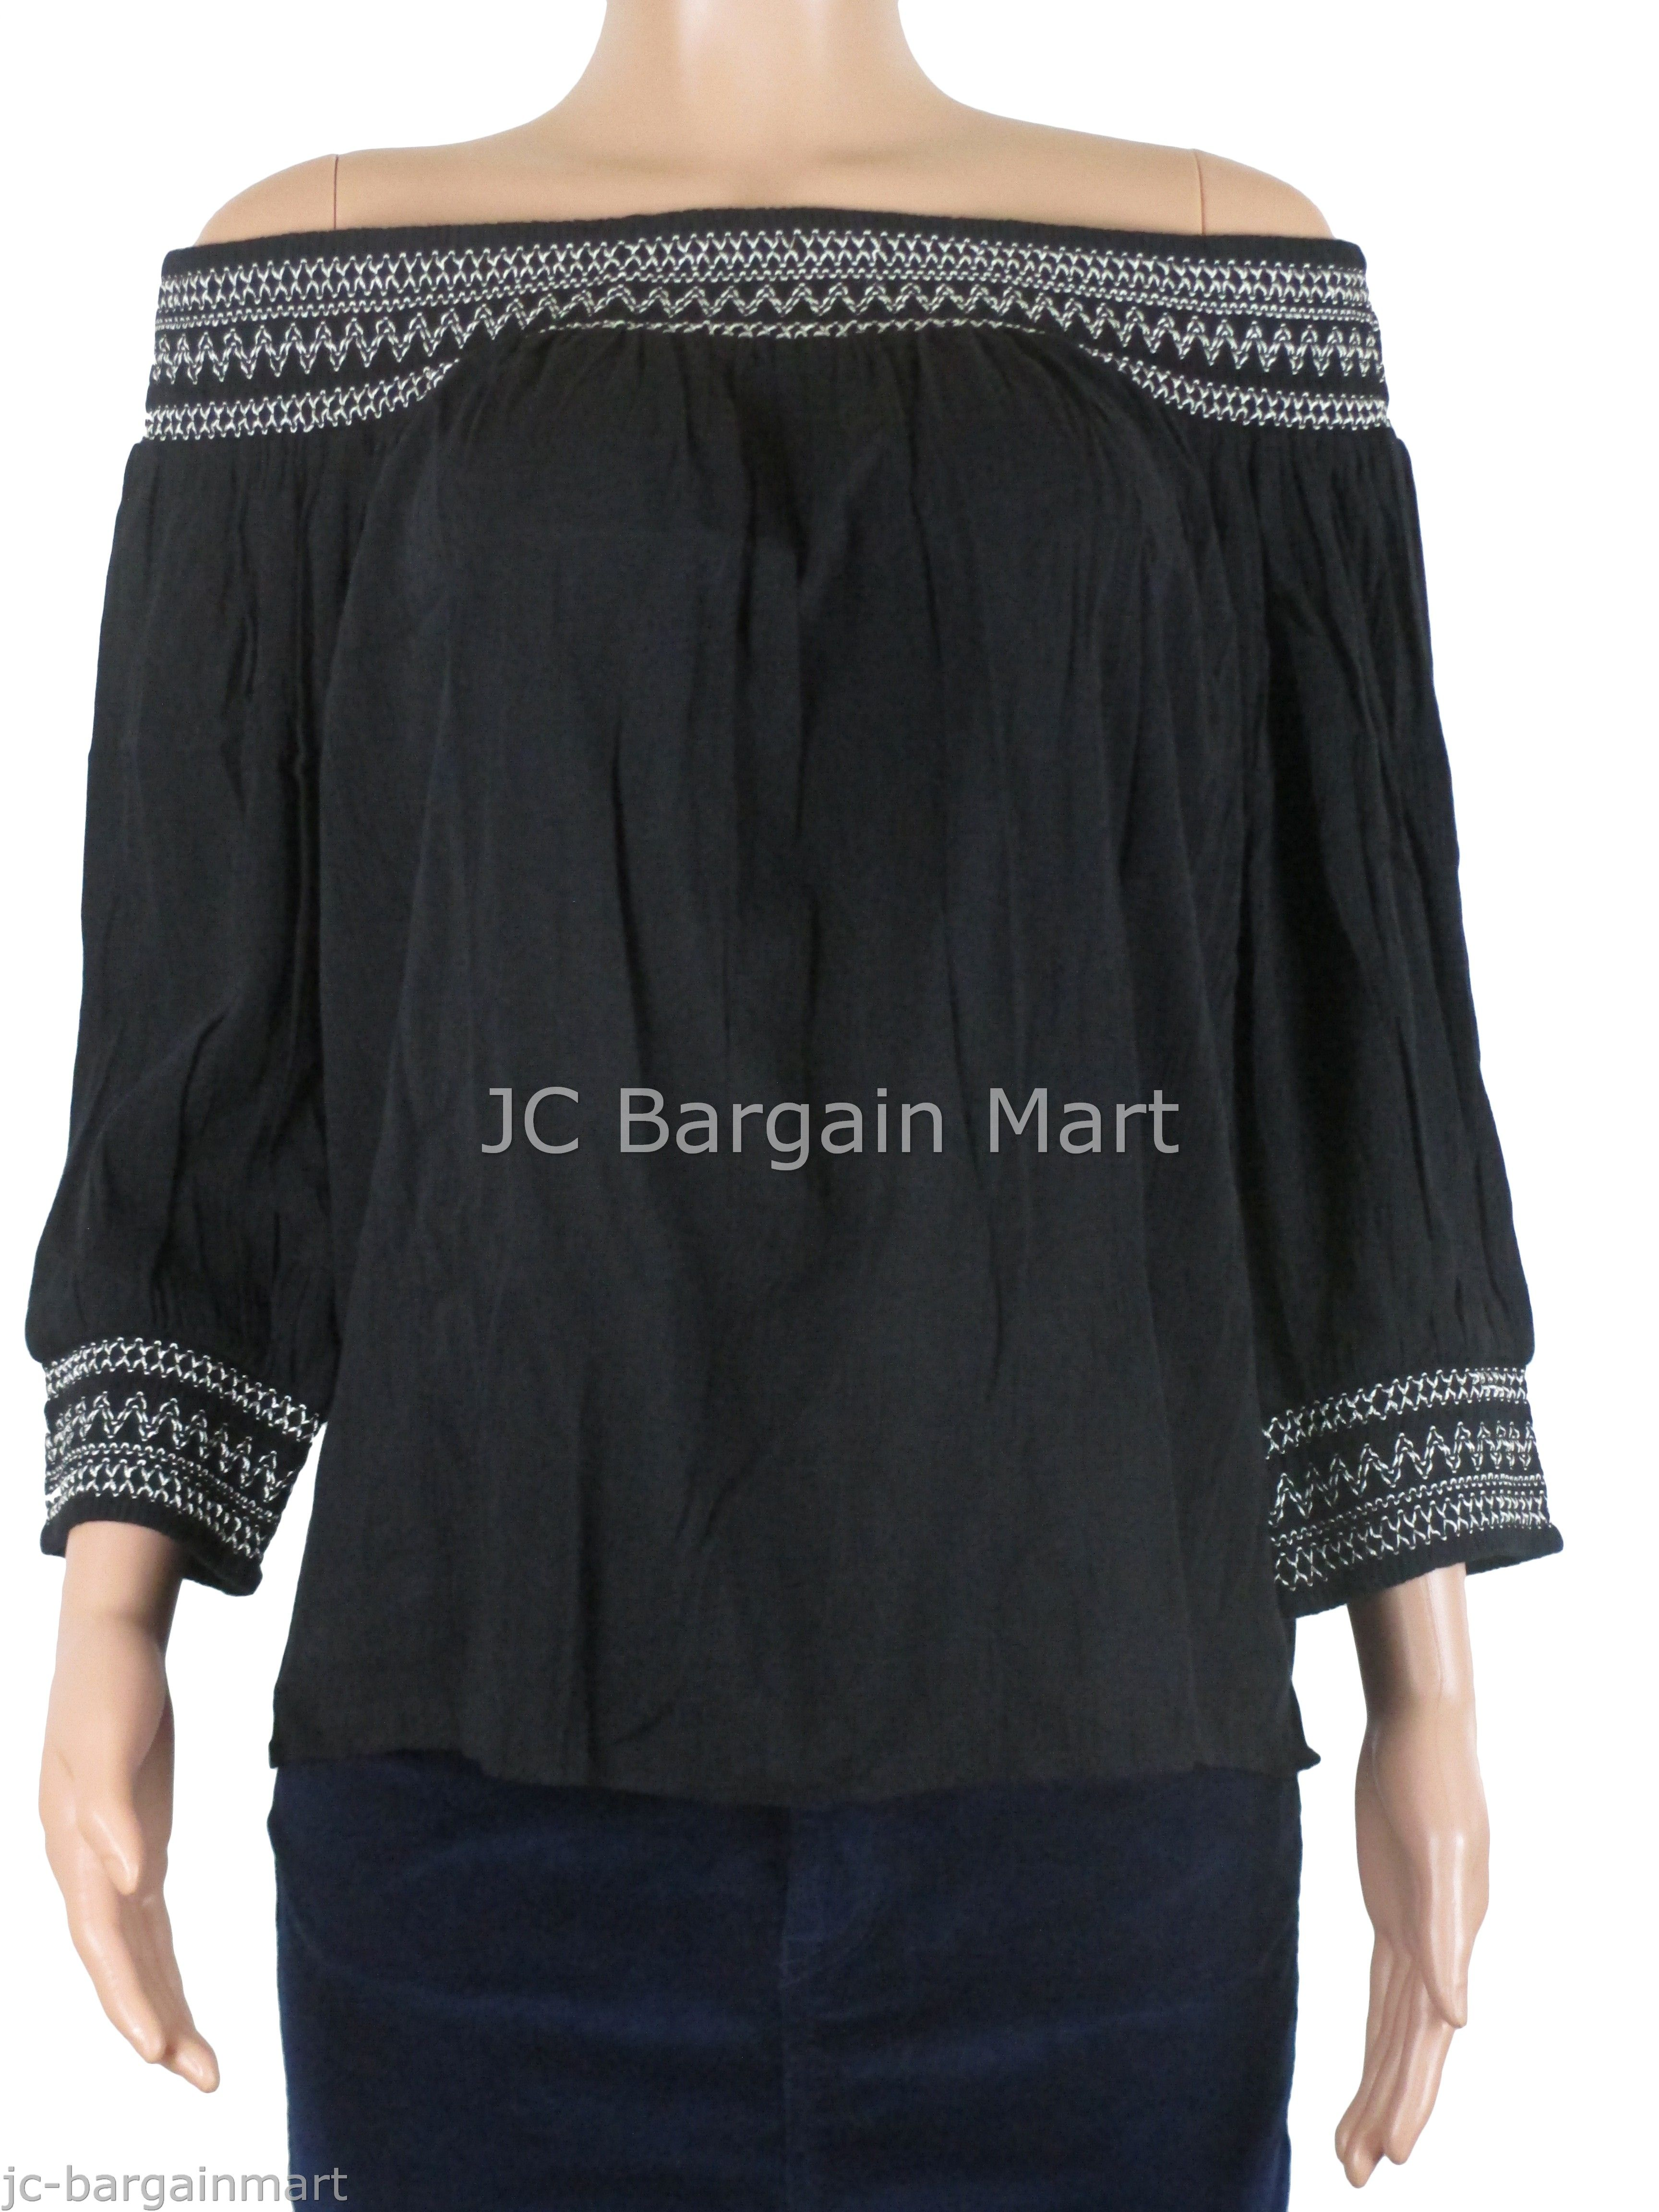 2374d57f81cc50 INC International Concepts Women's 3/4 Sleeve Off-The-Shoulder Peasant Top  55